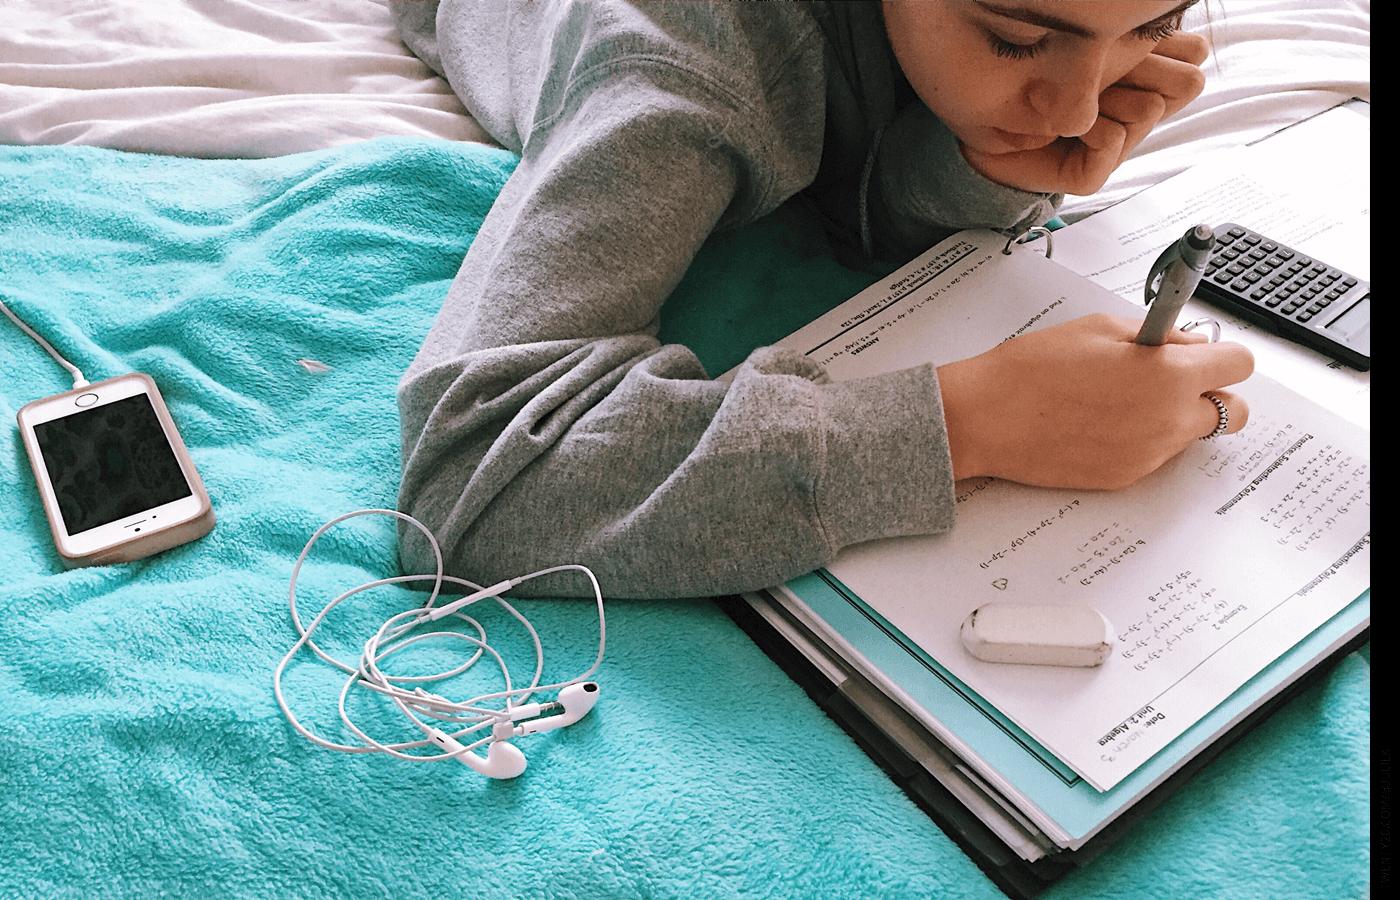 A student working on math homework.